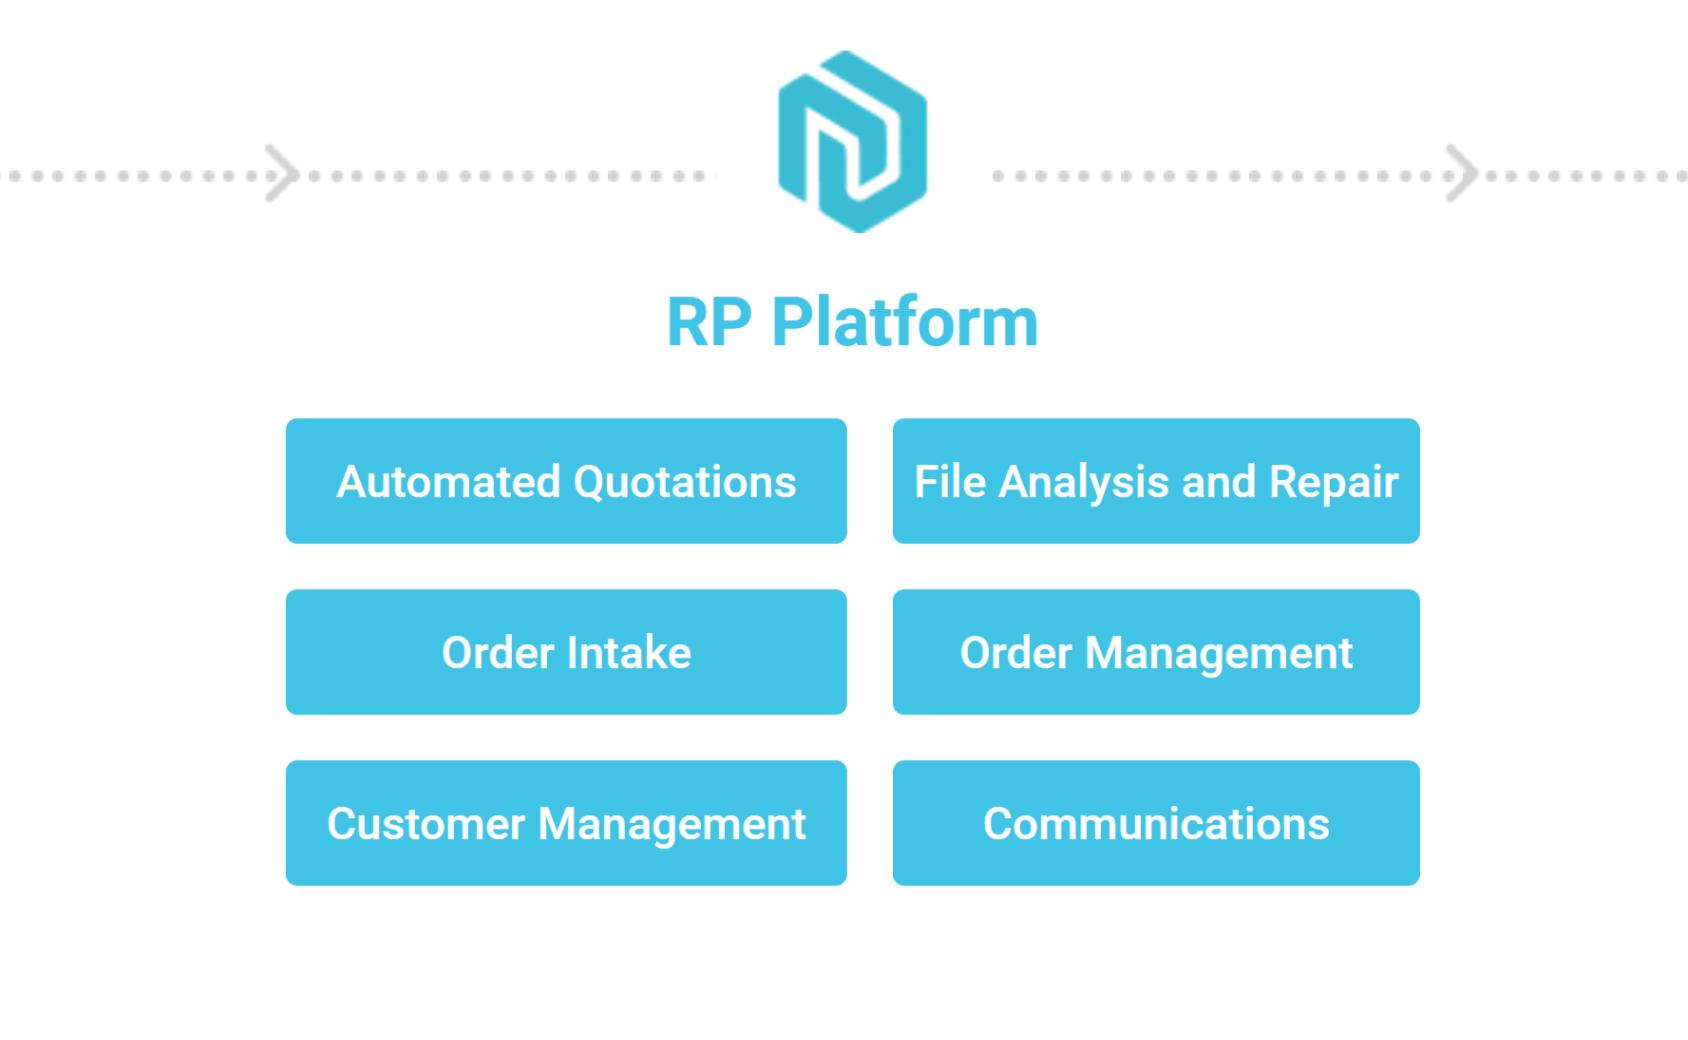 Features of the RP Platform software. Image via RP Platform.